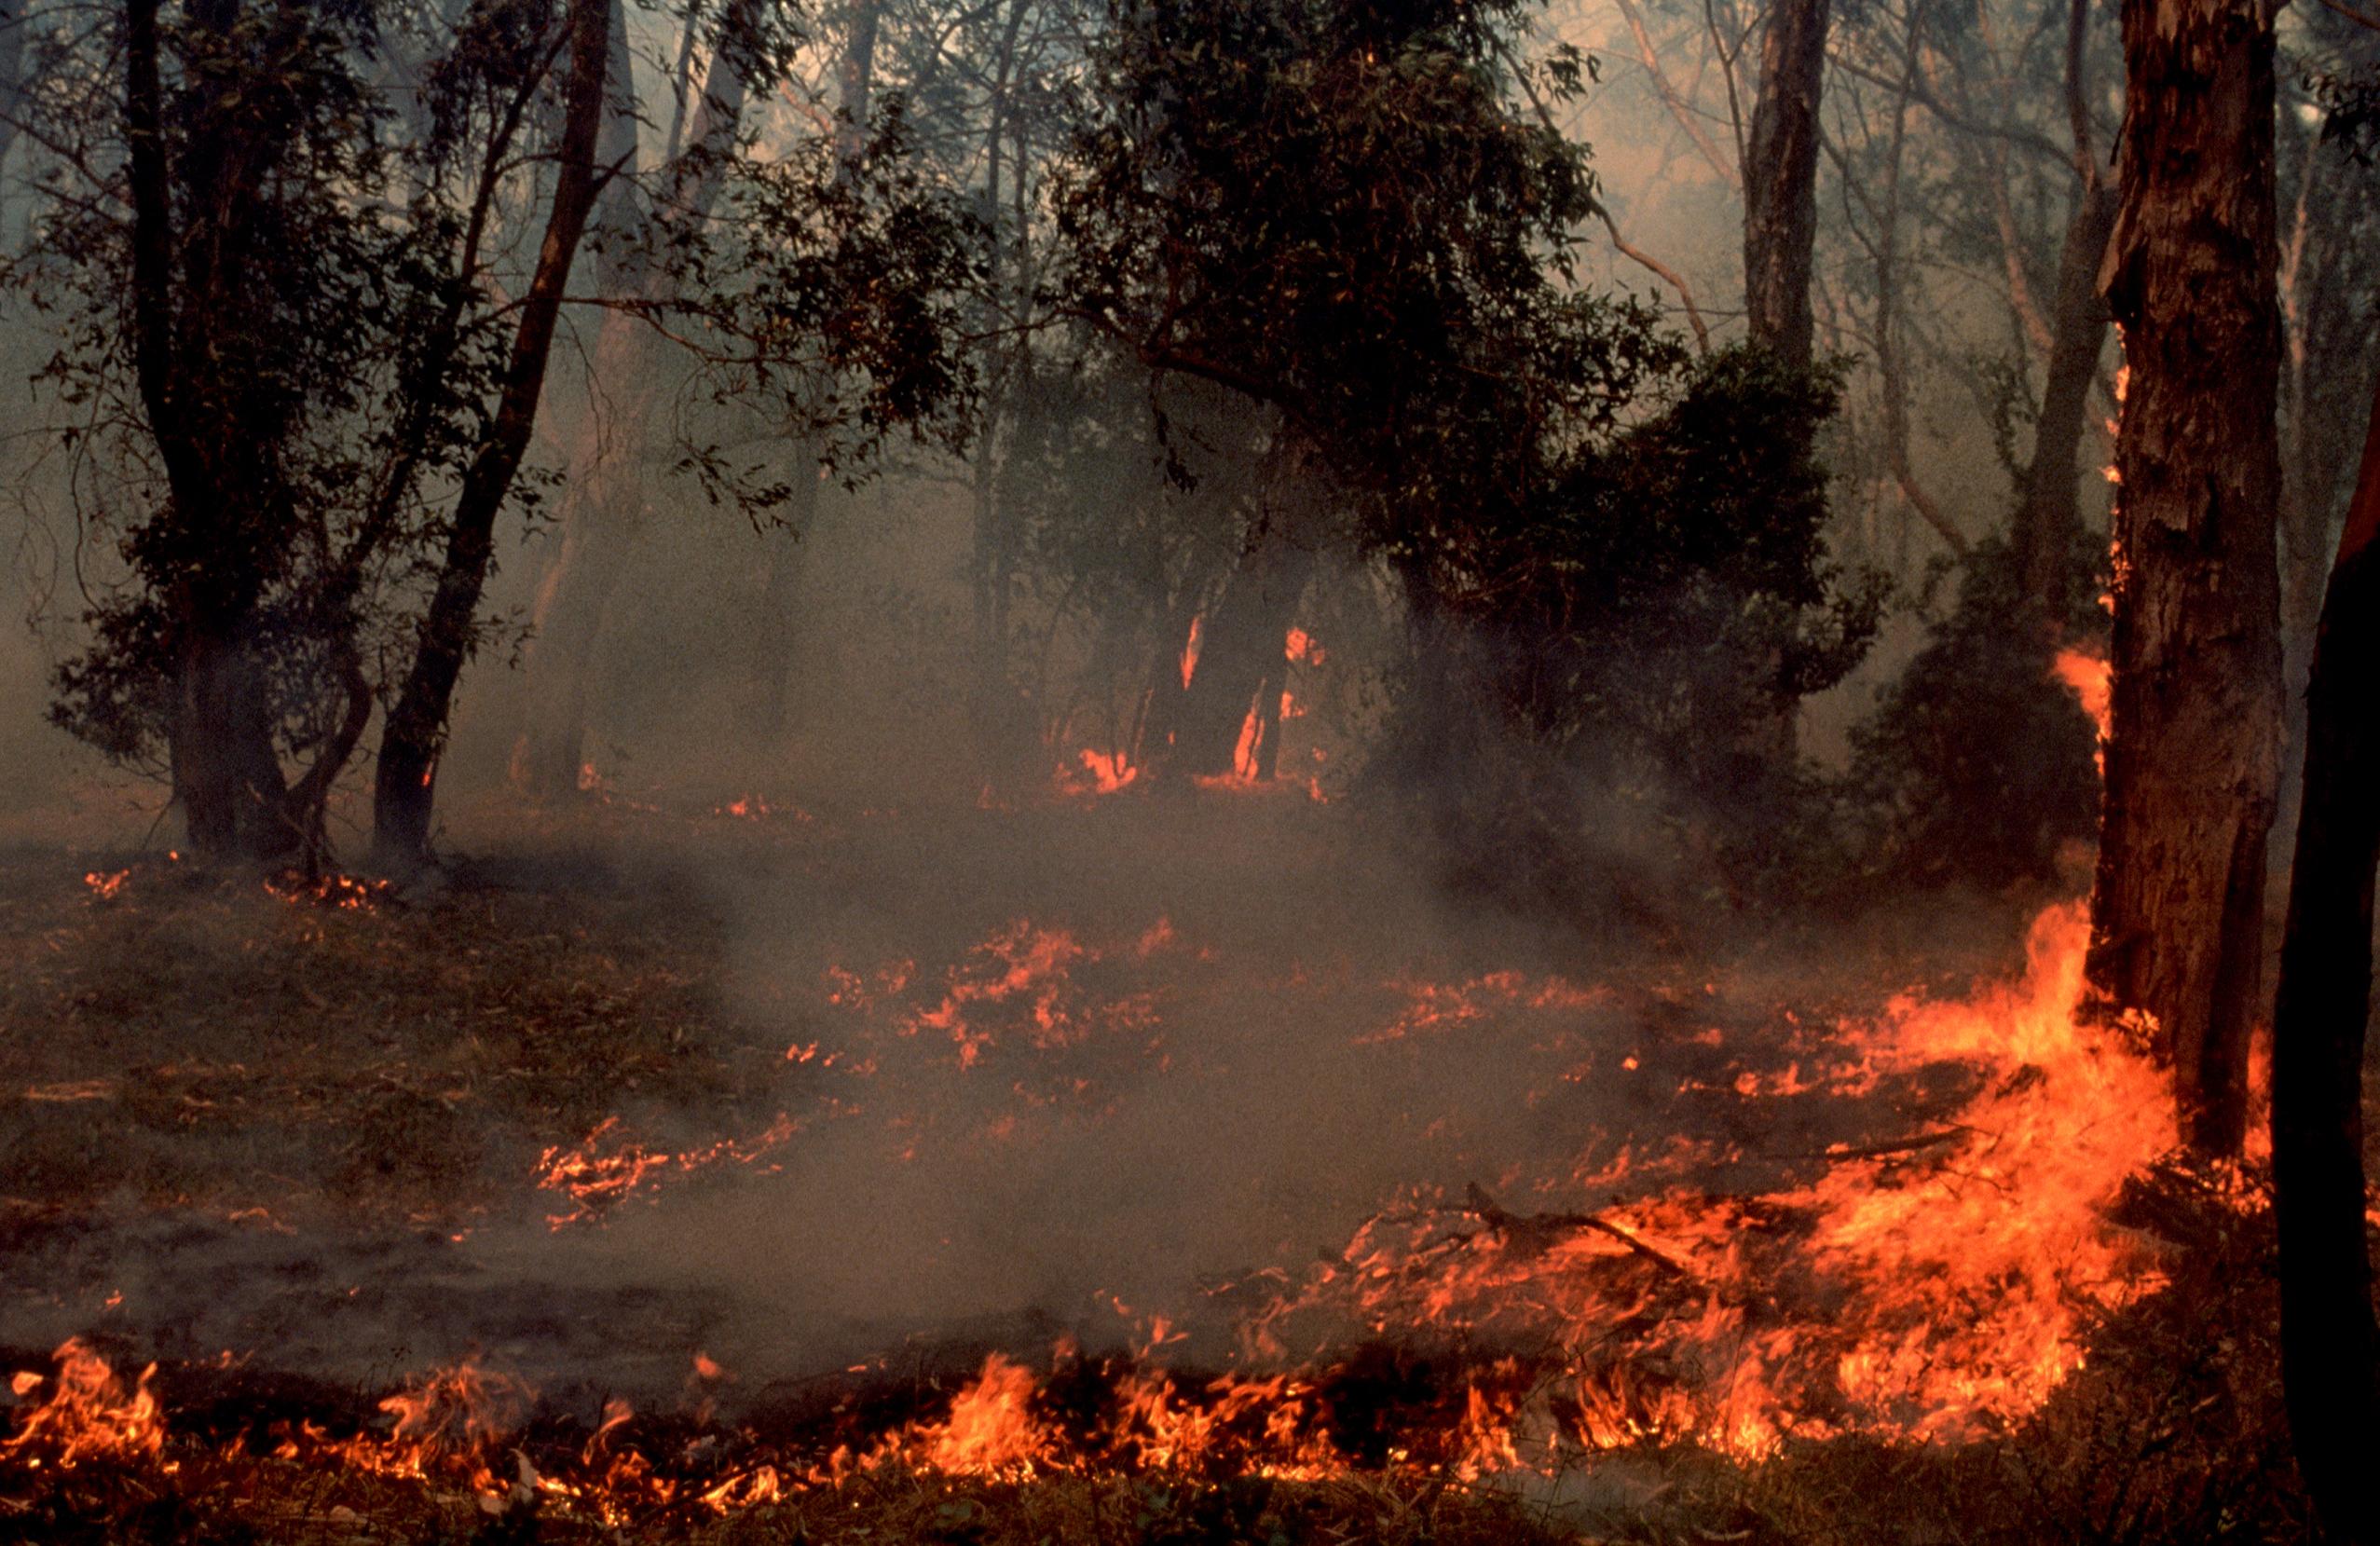 bushfire - photo #18